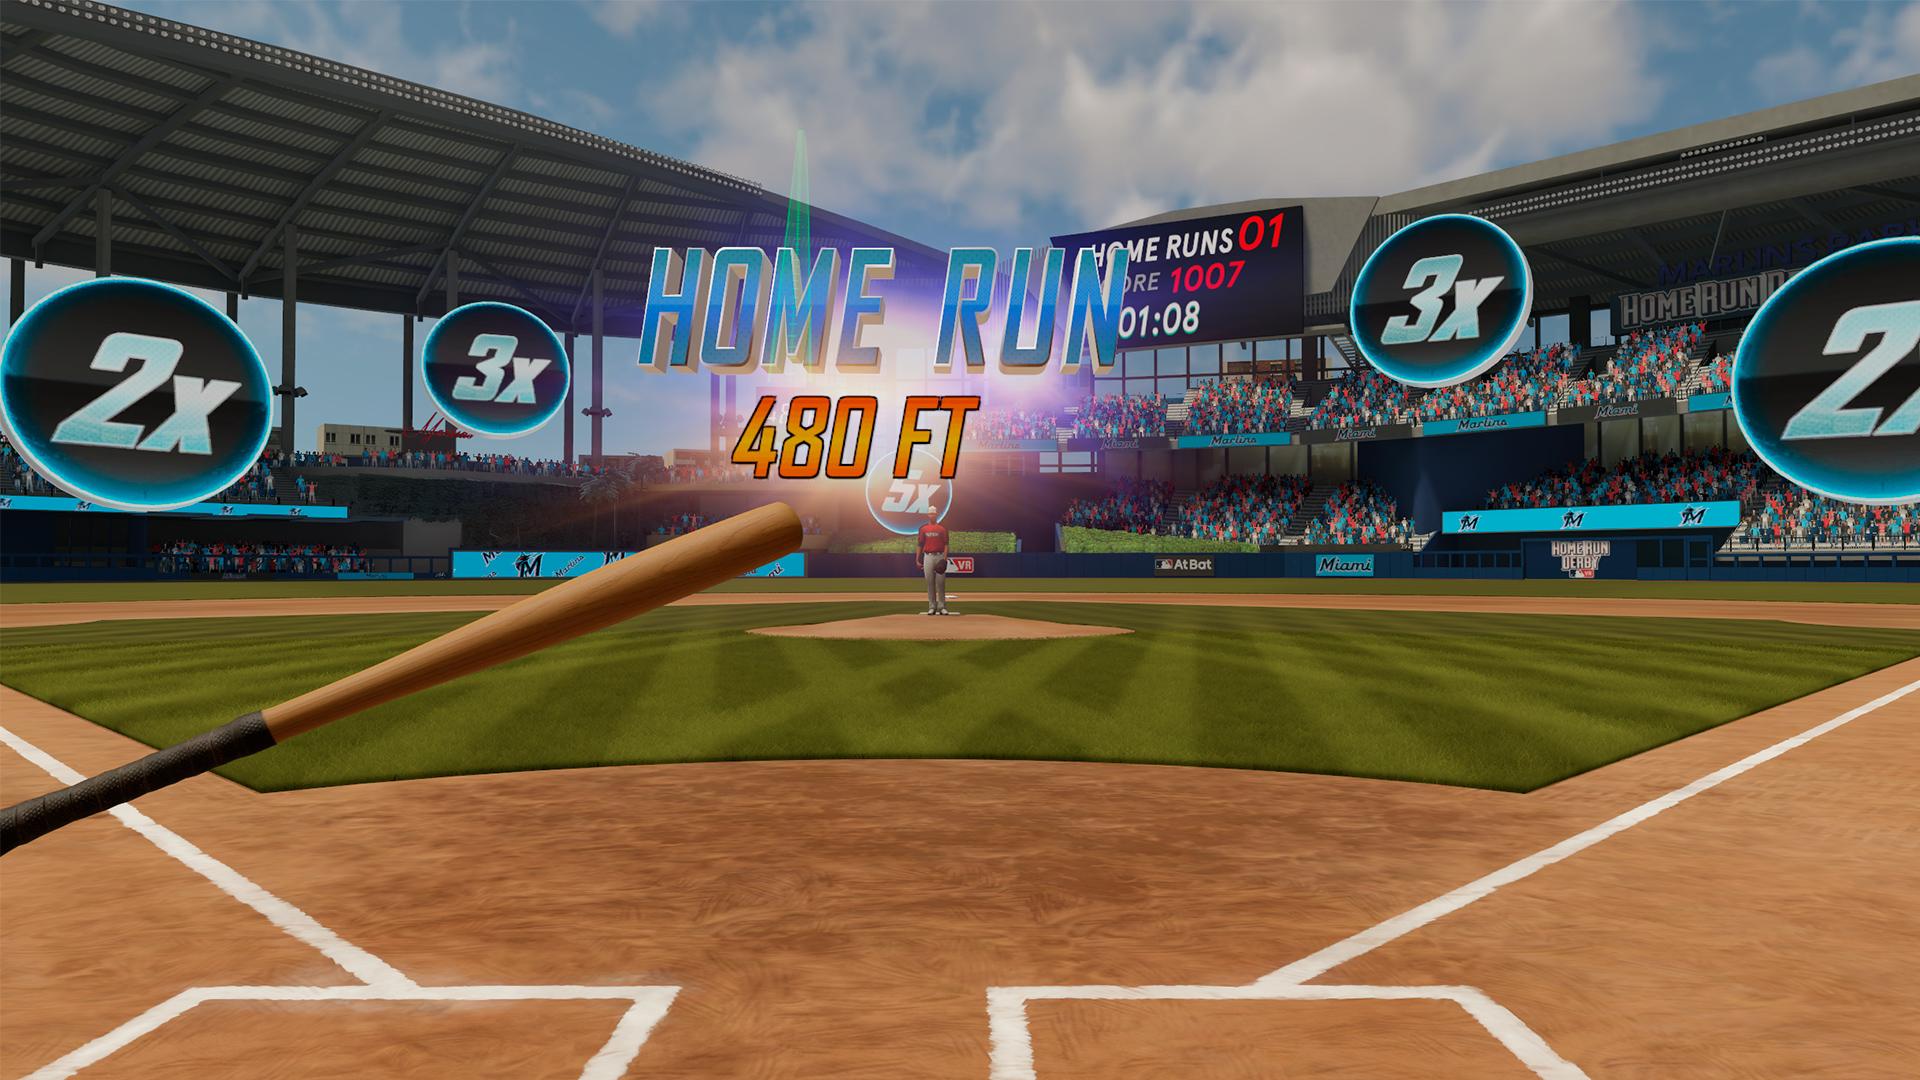 Home Run Derby 2020 Date.Mlb Home Run Derby Vr